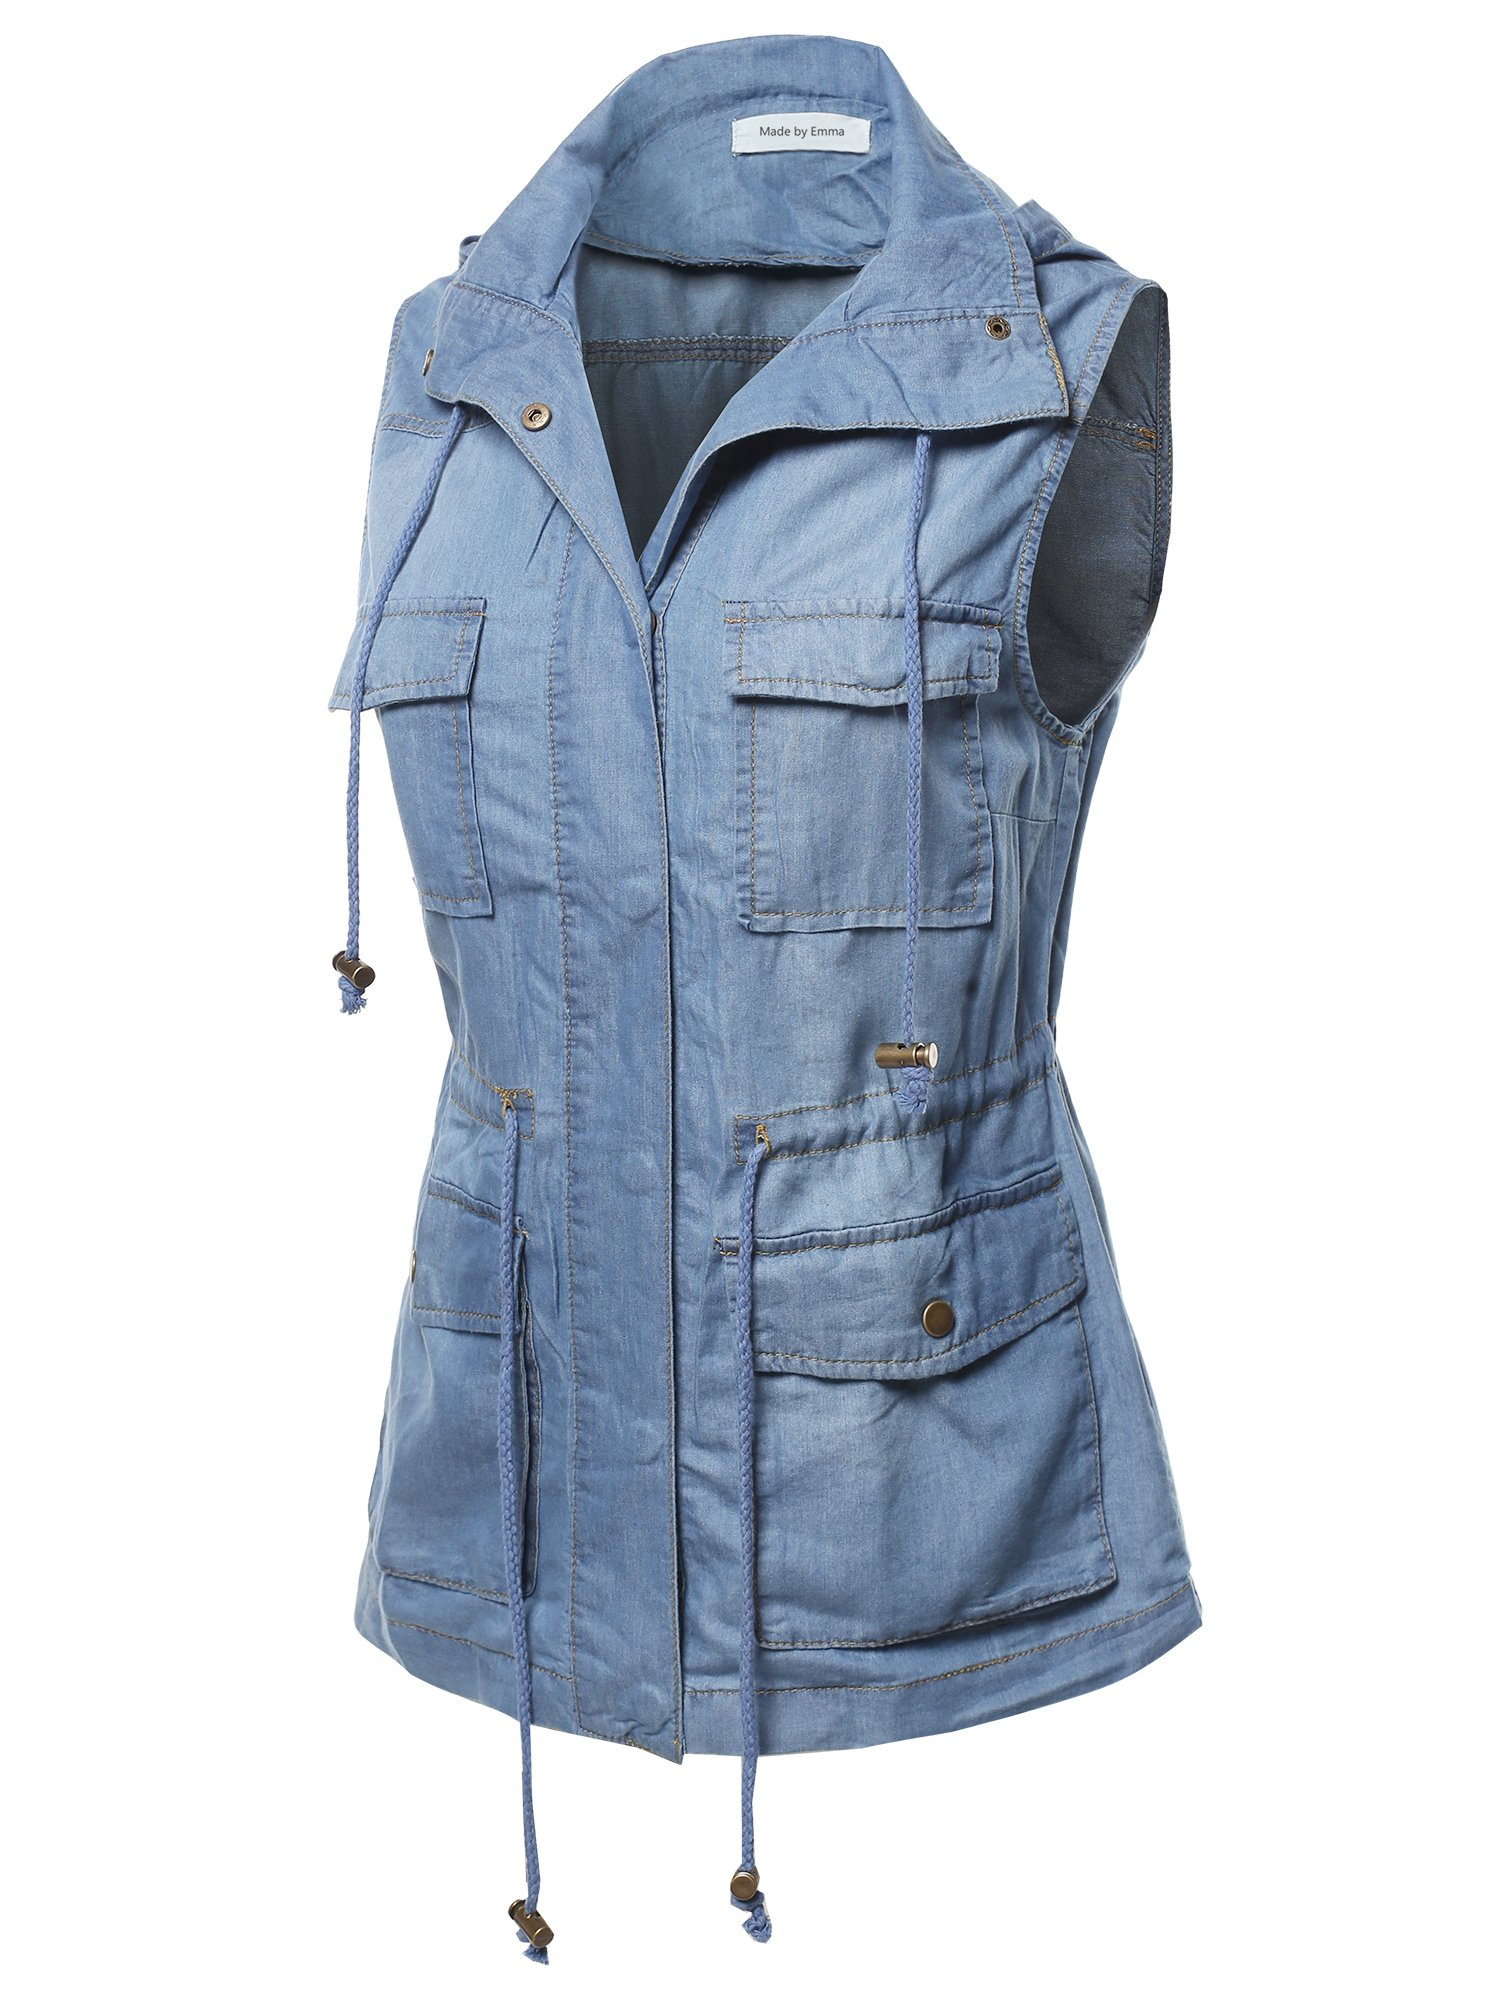 Made by Emma Casual Denim Sleeveless Military Safari Utility Drawstring Hoodie Vest S